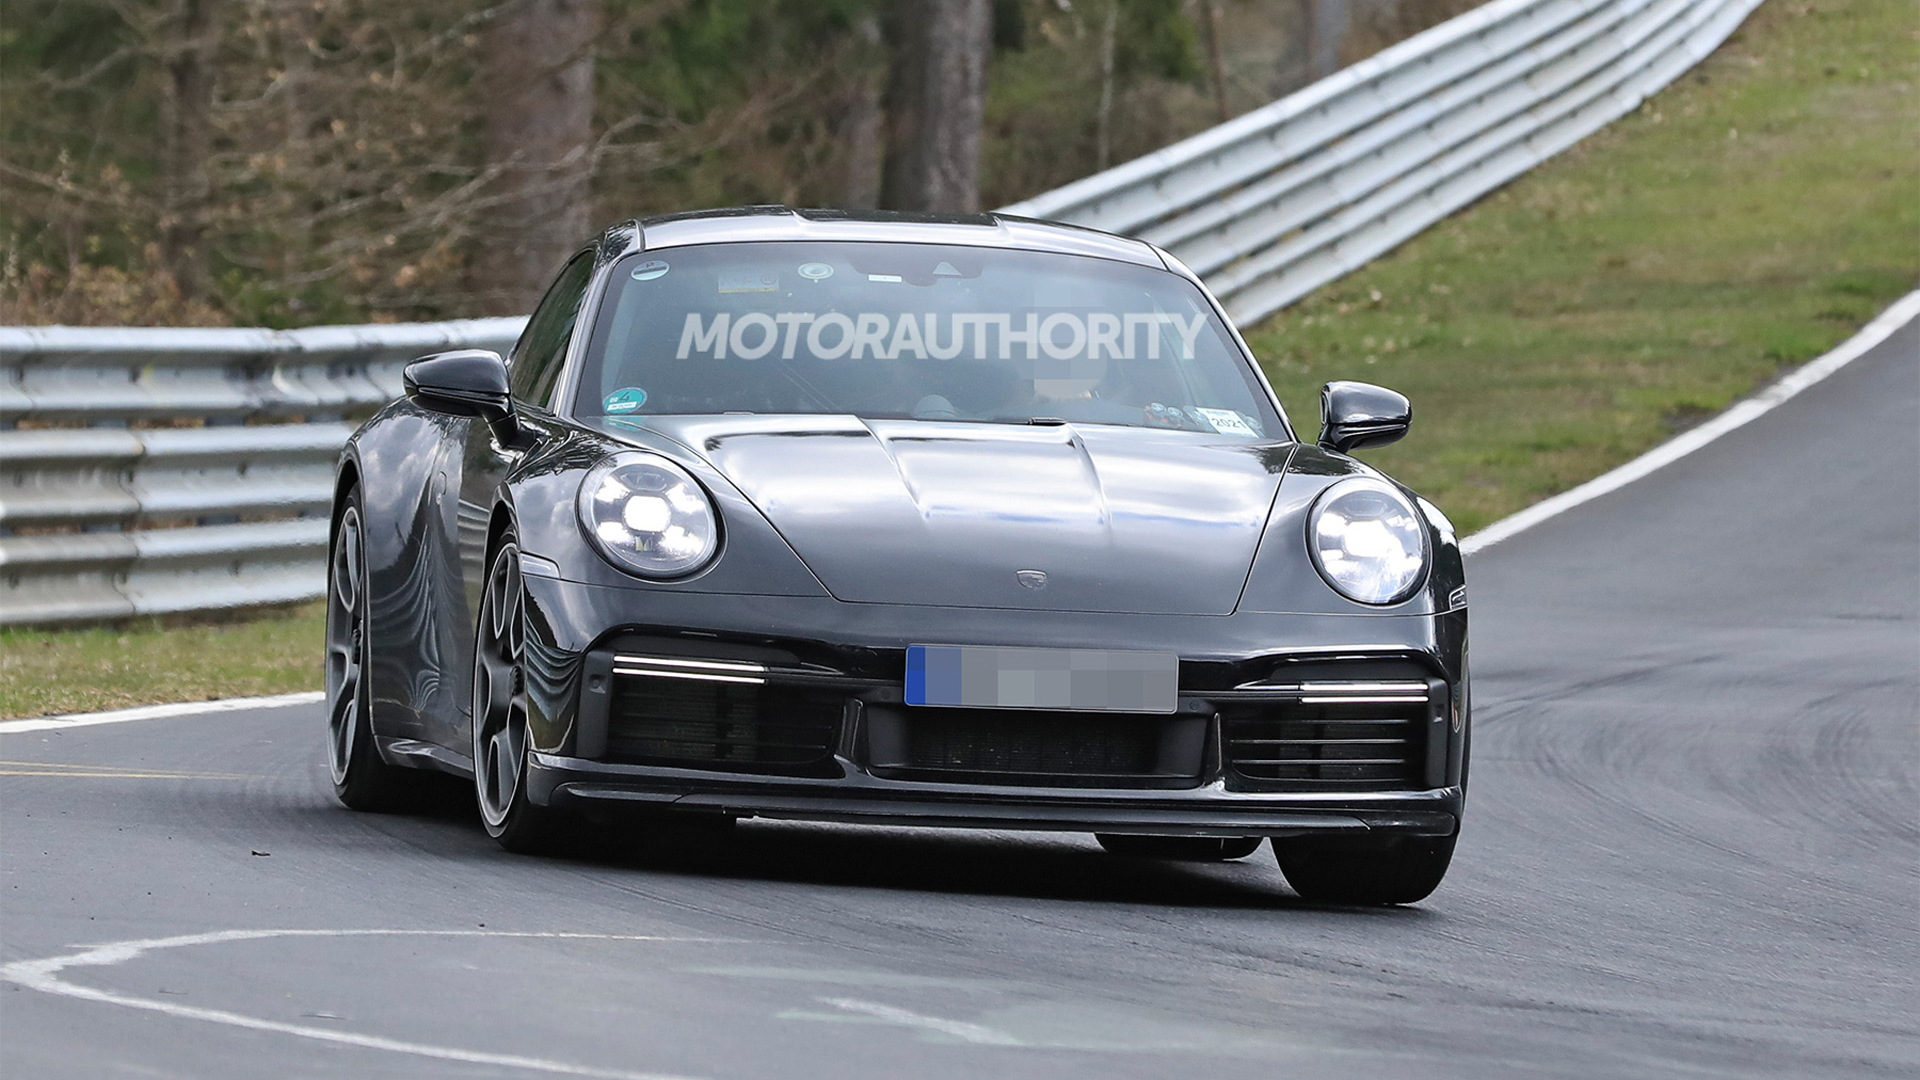 2022 Porsche 911 Sport Classic spy shots - Photo credit: S. Baldauf/SB-Medien